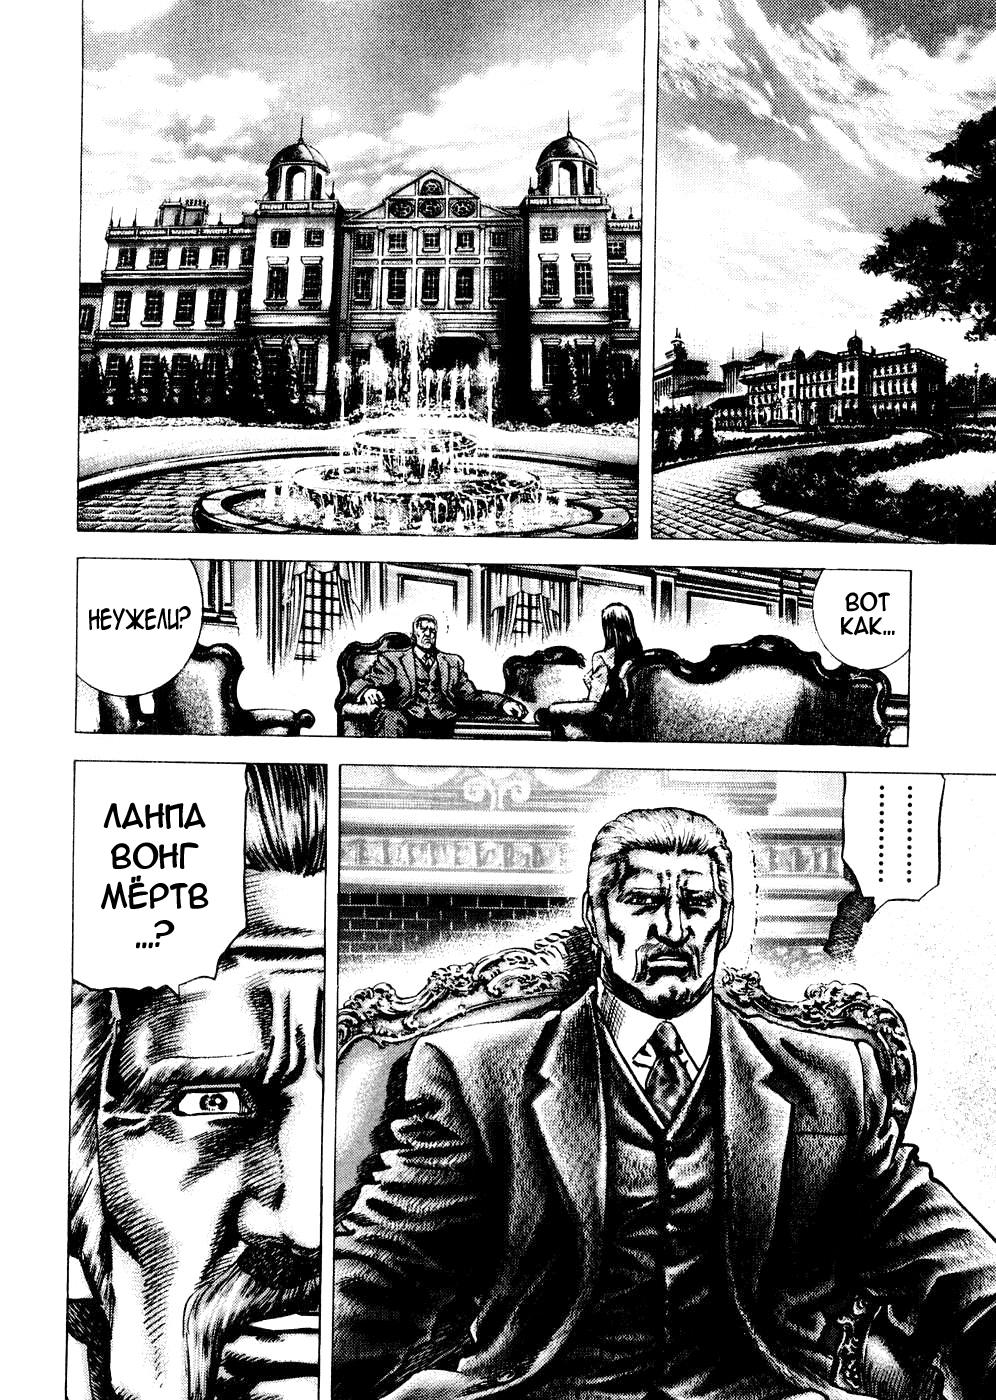 https://r1.ninemanga.com/comics/pic2/6/29190/292249/1461595059204.jpg Page 2